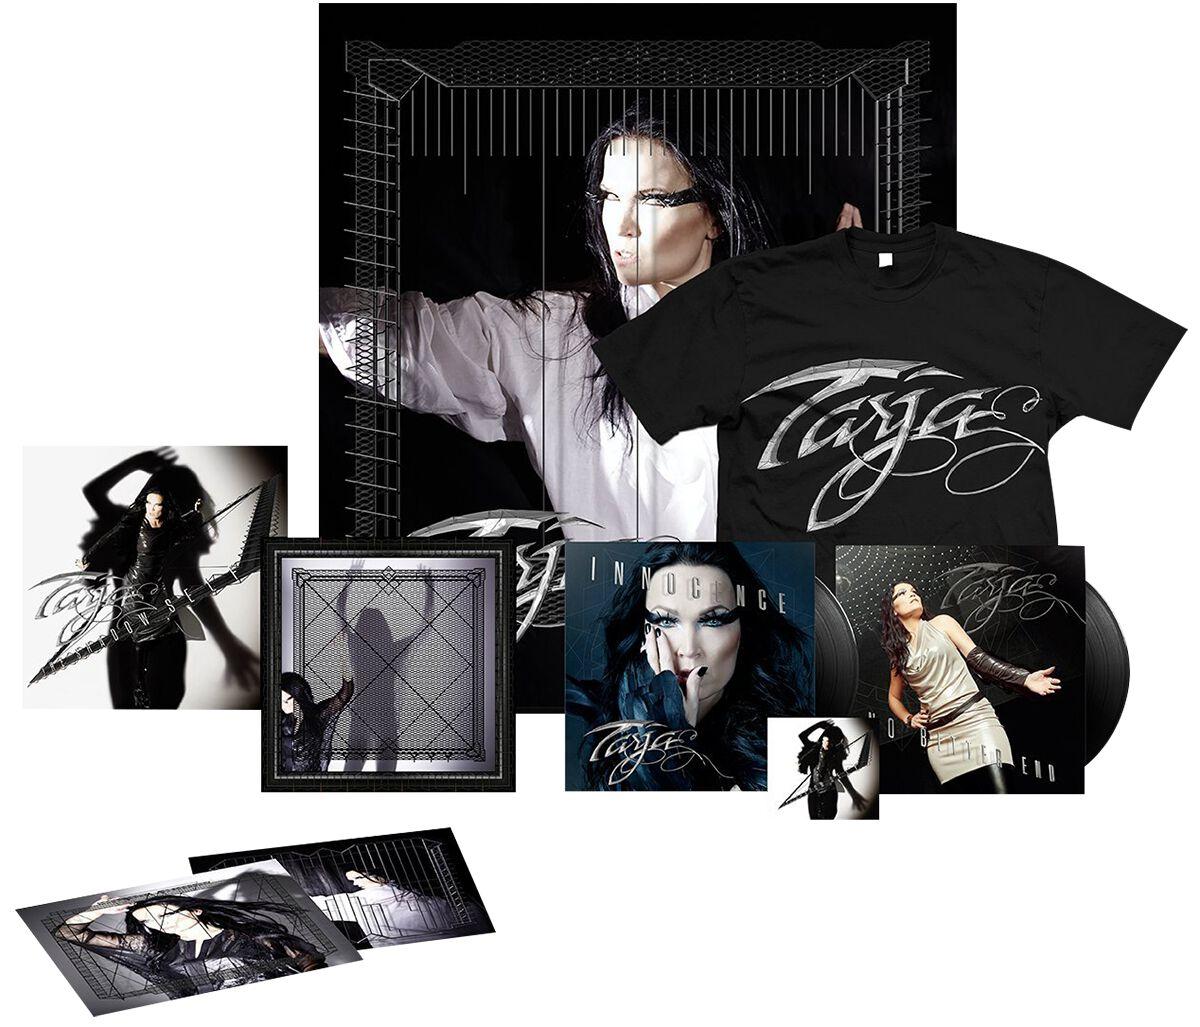 Image of Tarja The shadow self CD & DVD & T-Shirt (L) Standard